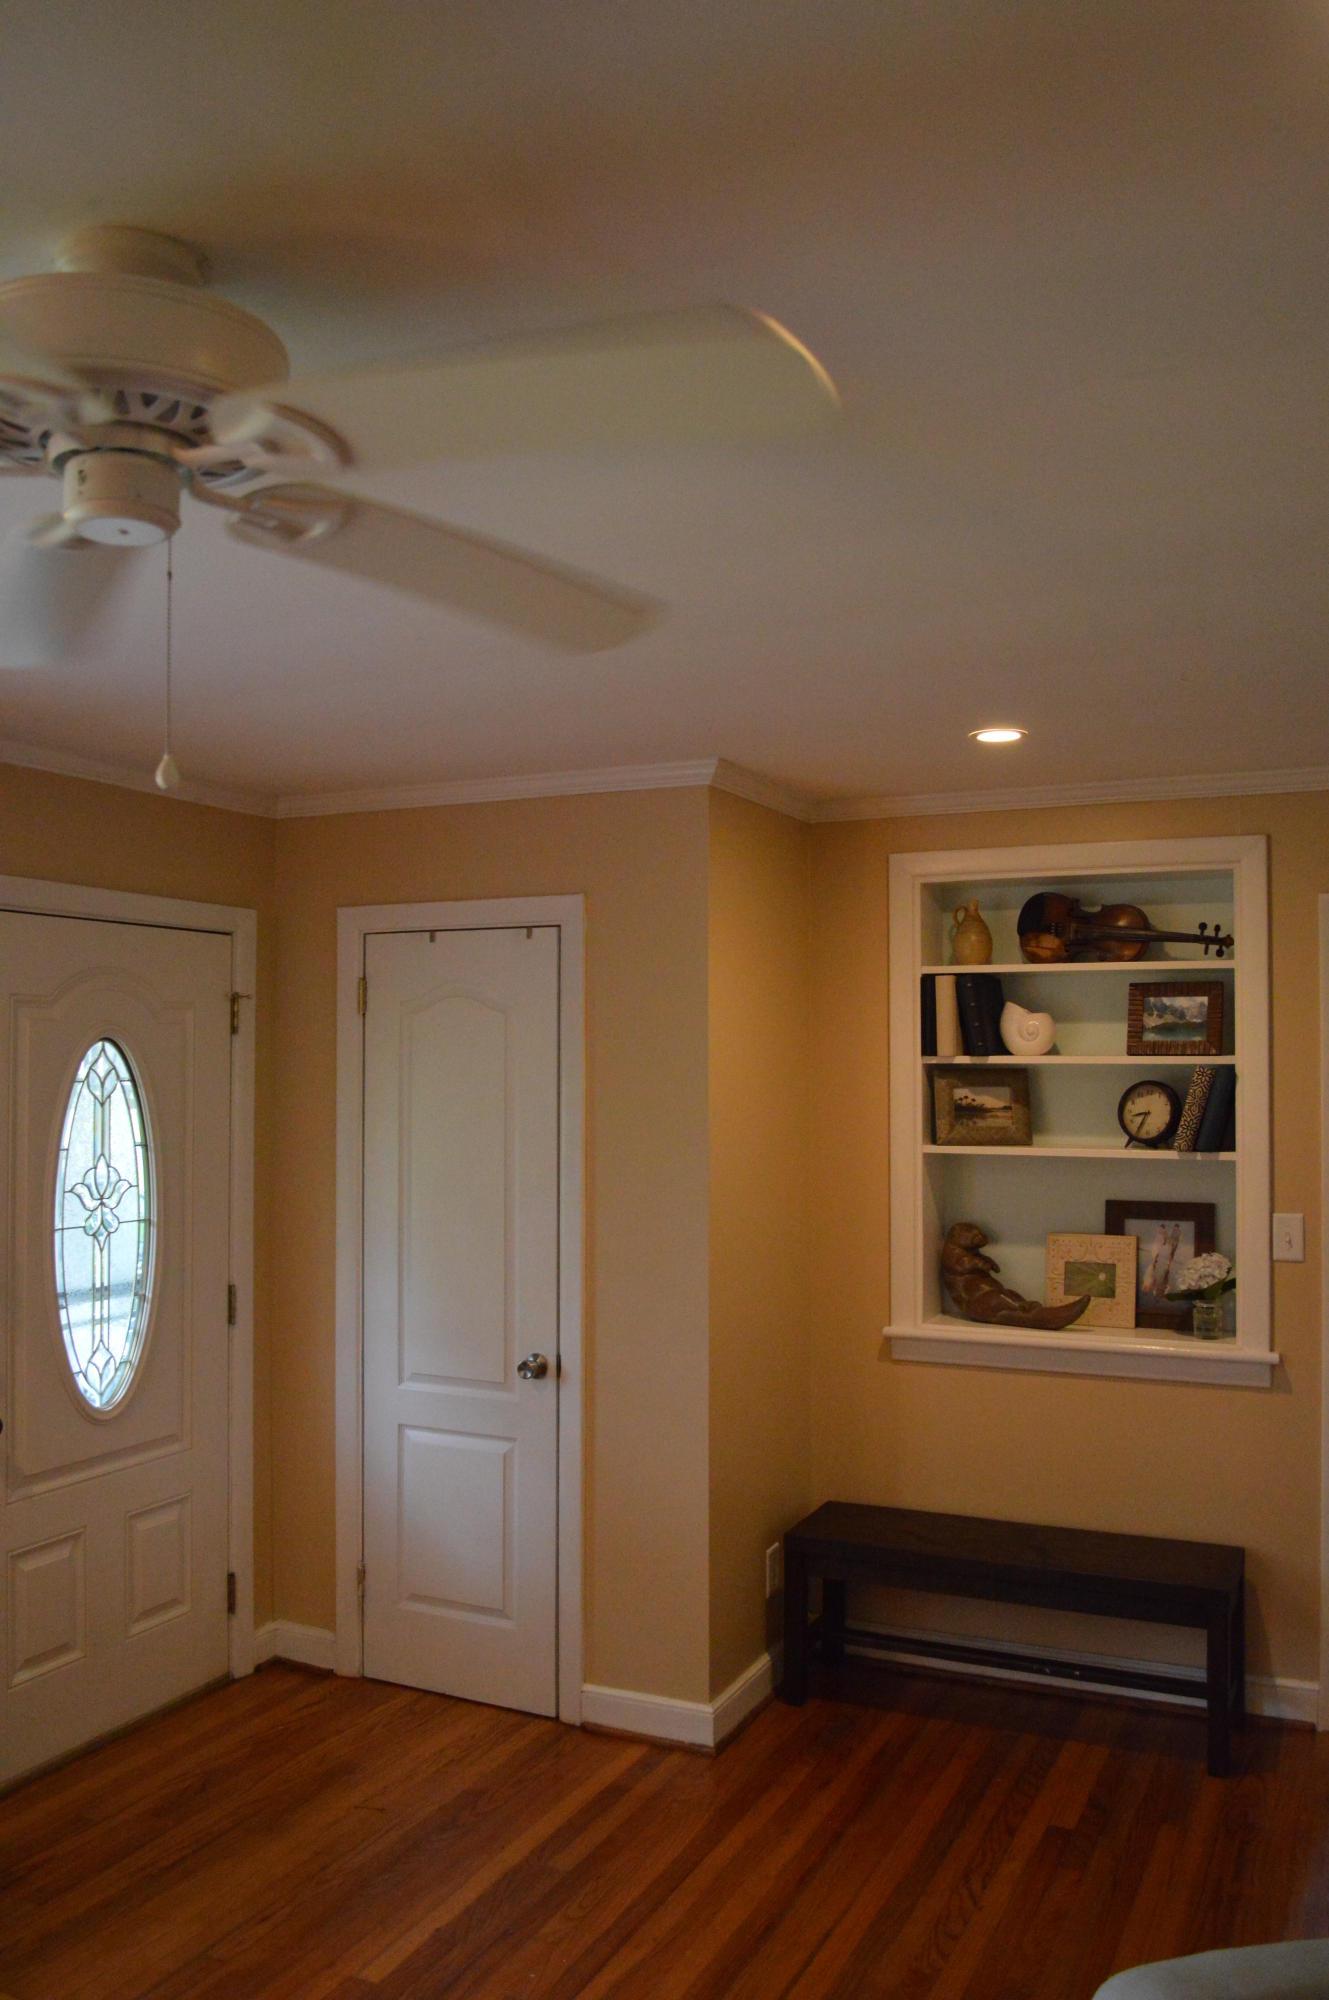 Woodland Shores Annex Homes For Sale - 436 Carol, Charleston, SC - 5